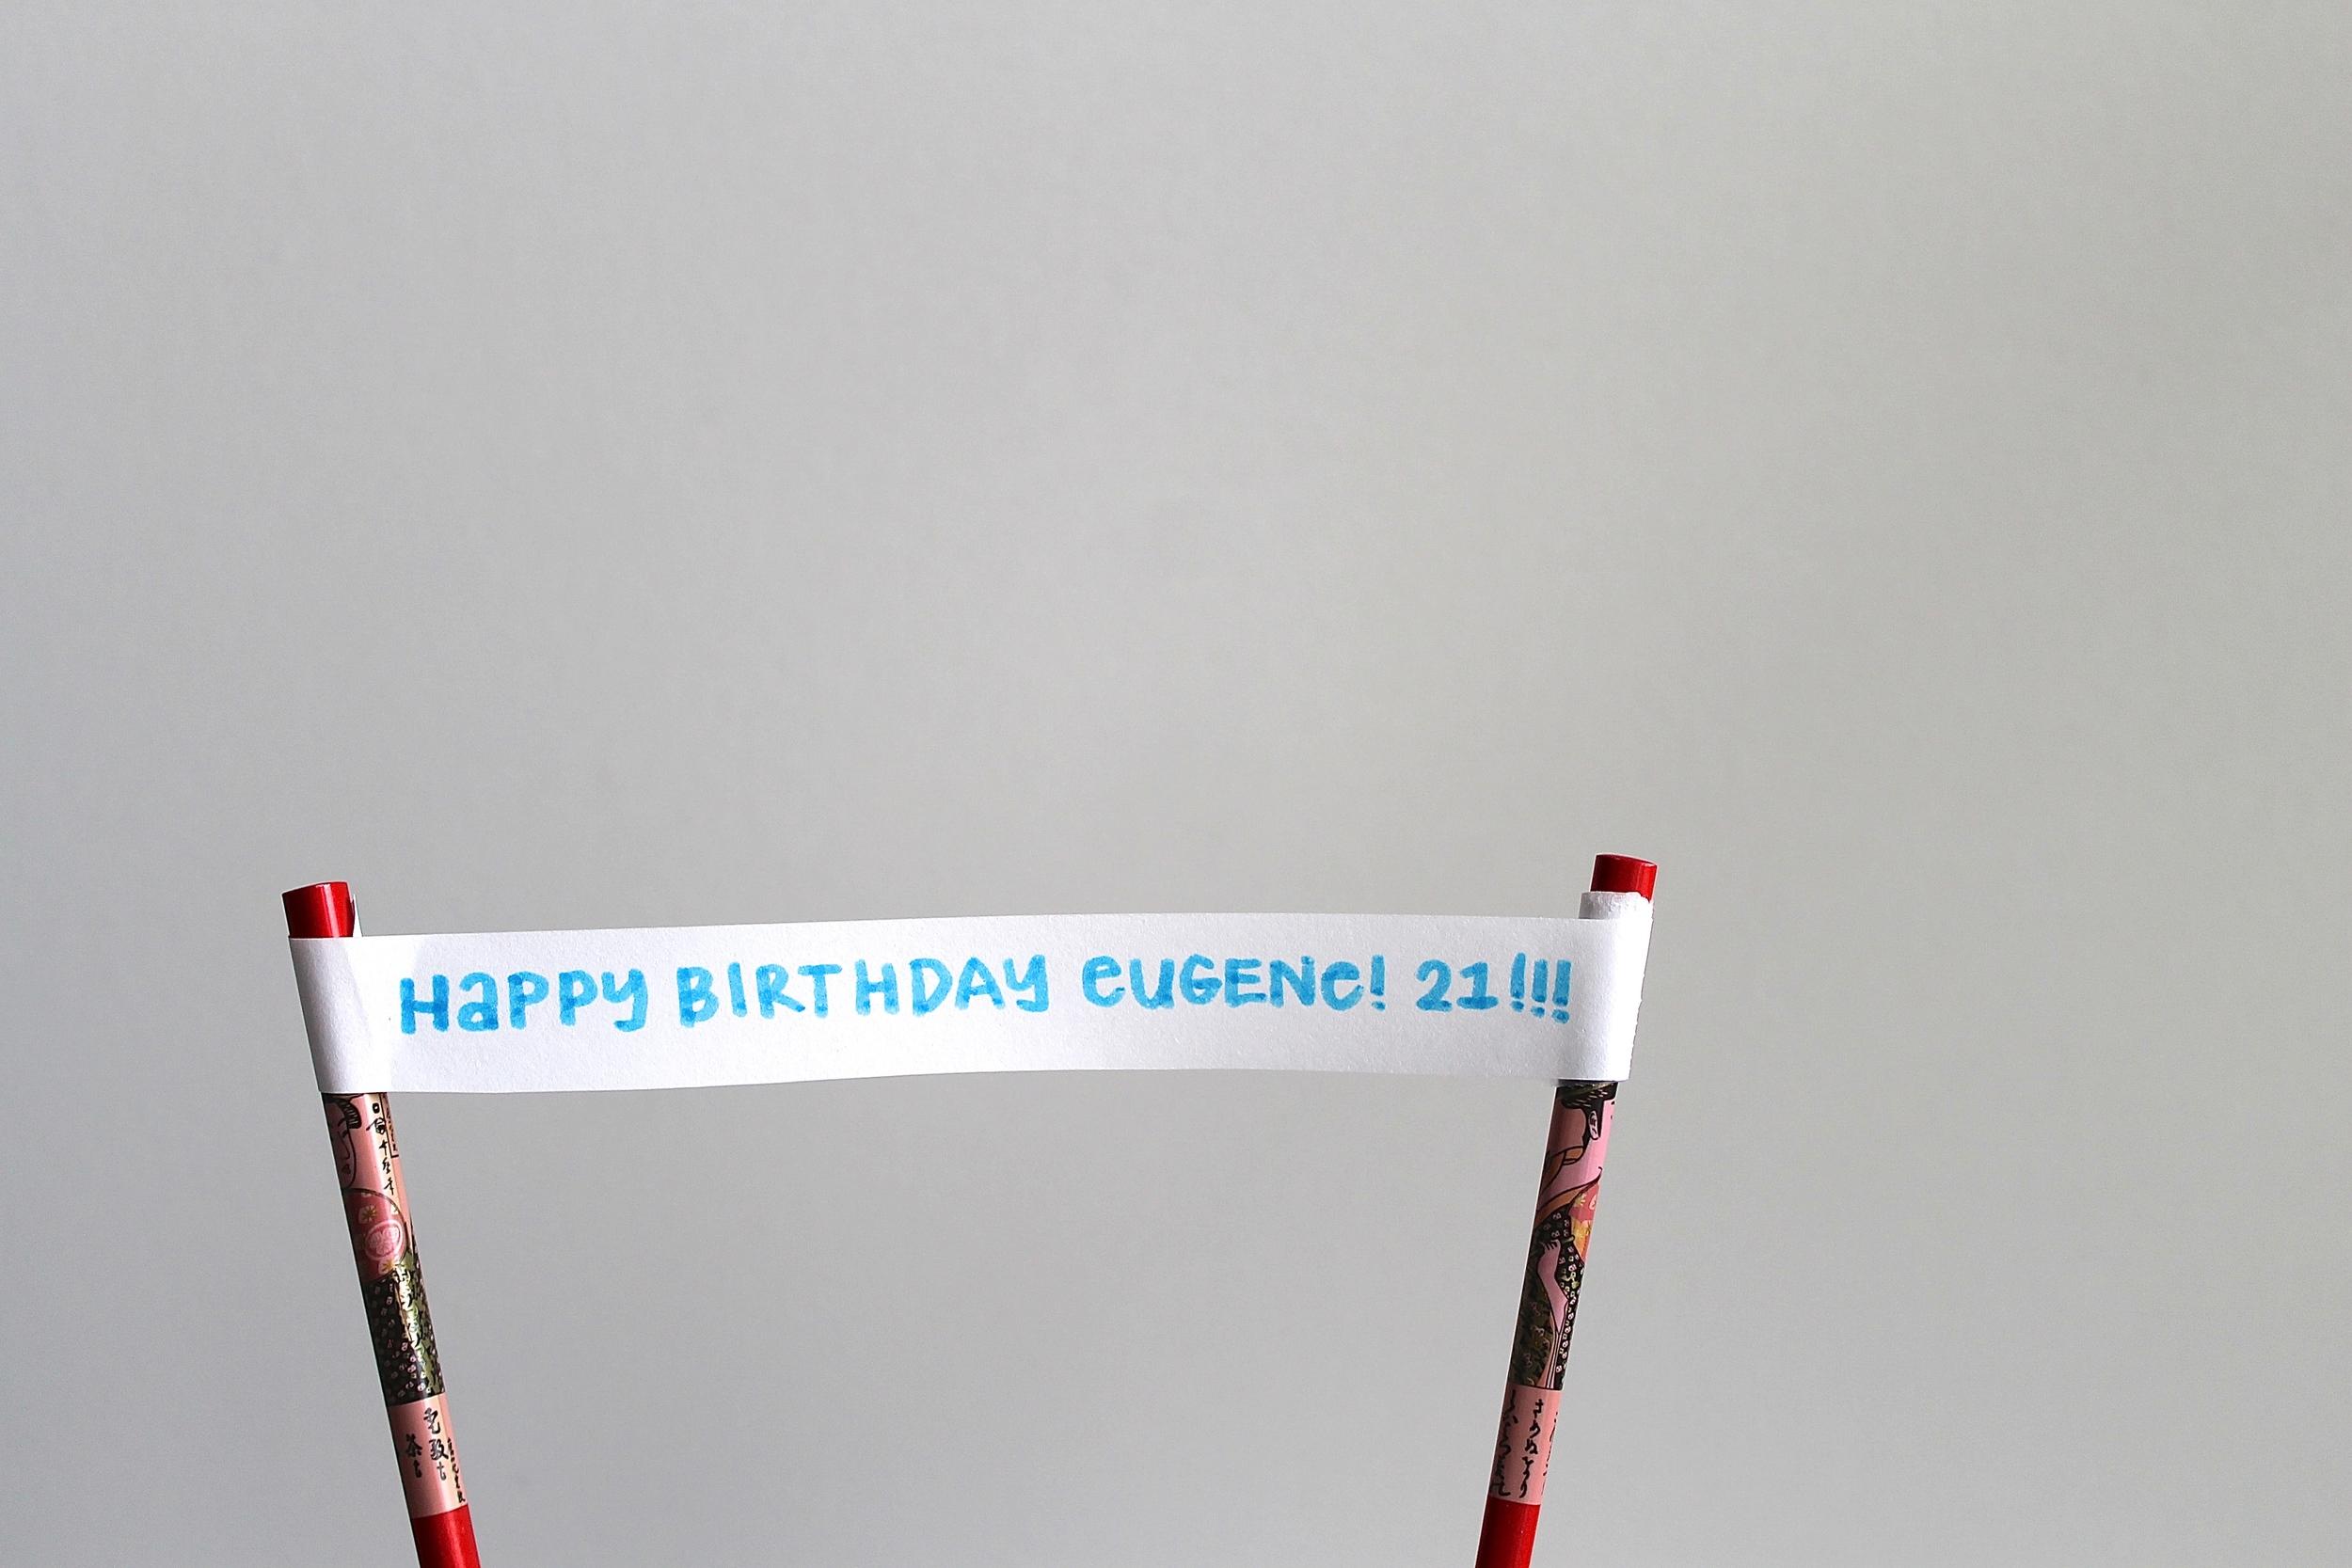 Peanut-butter-birthday-cake-3.jpg